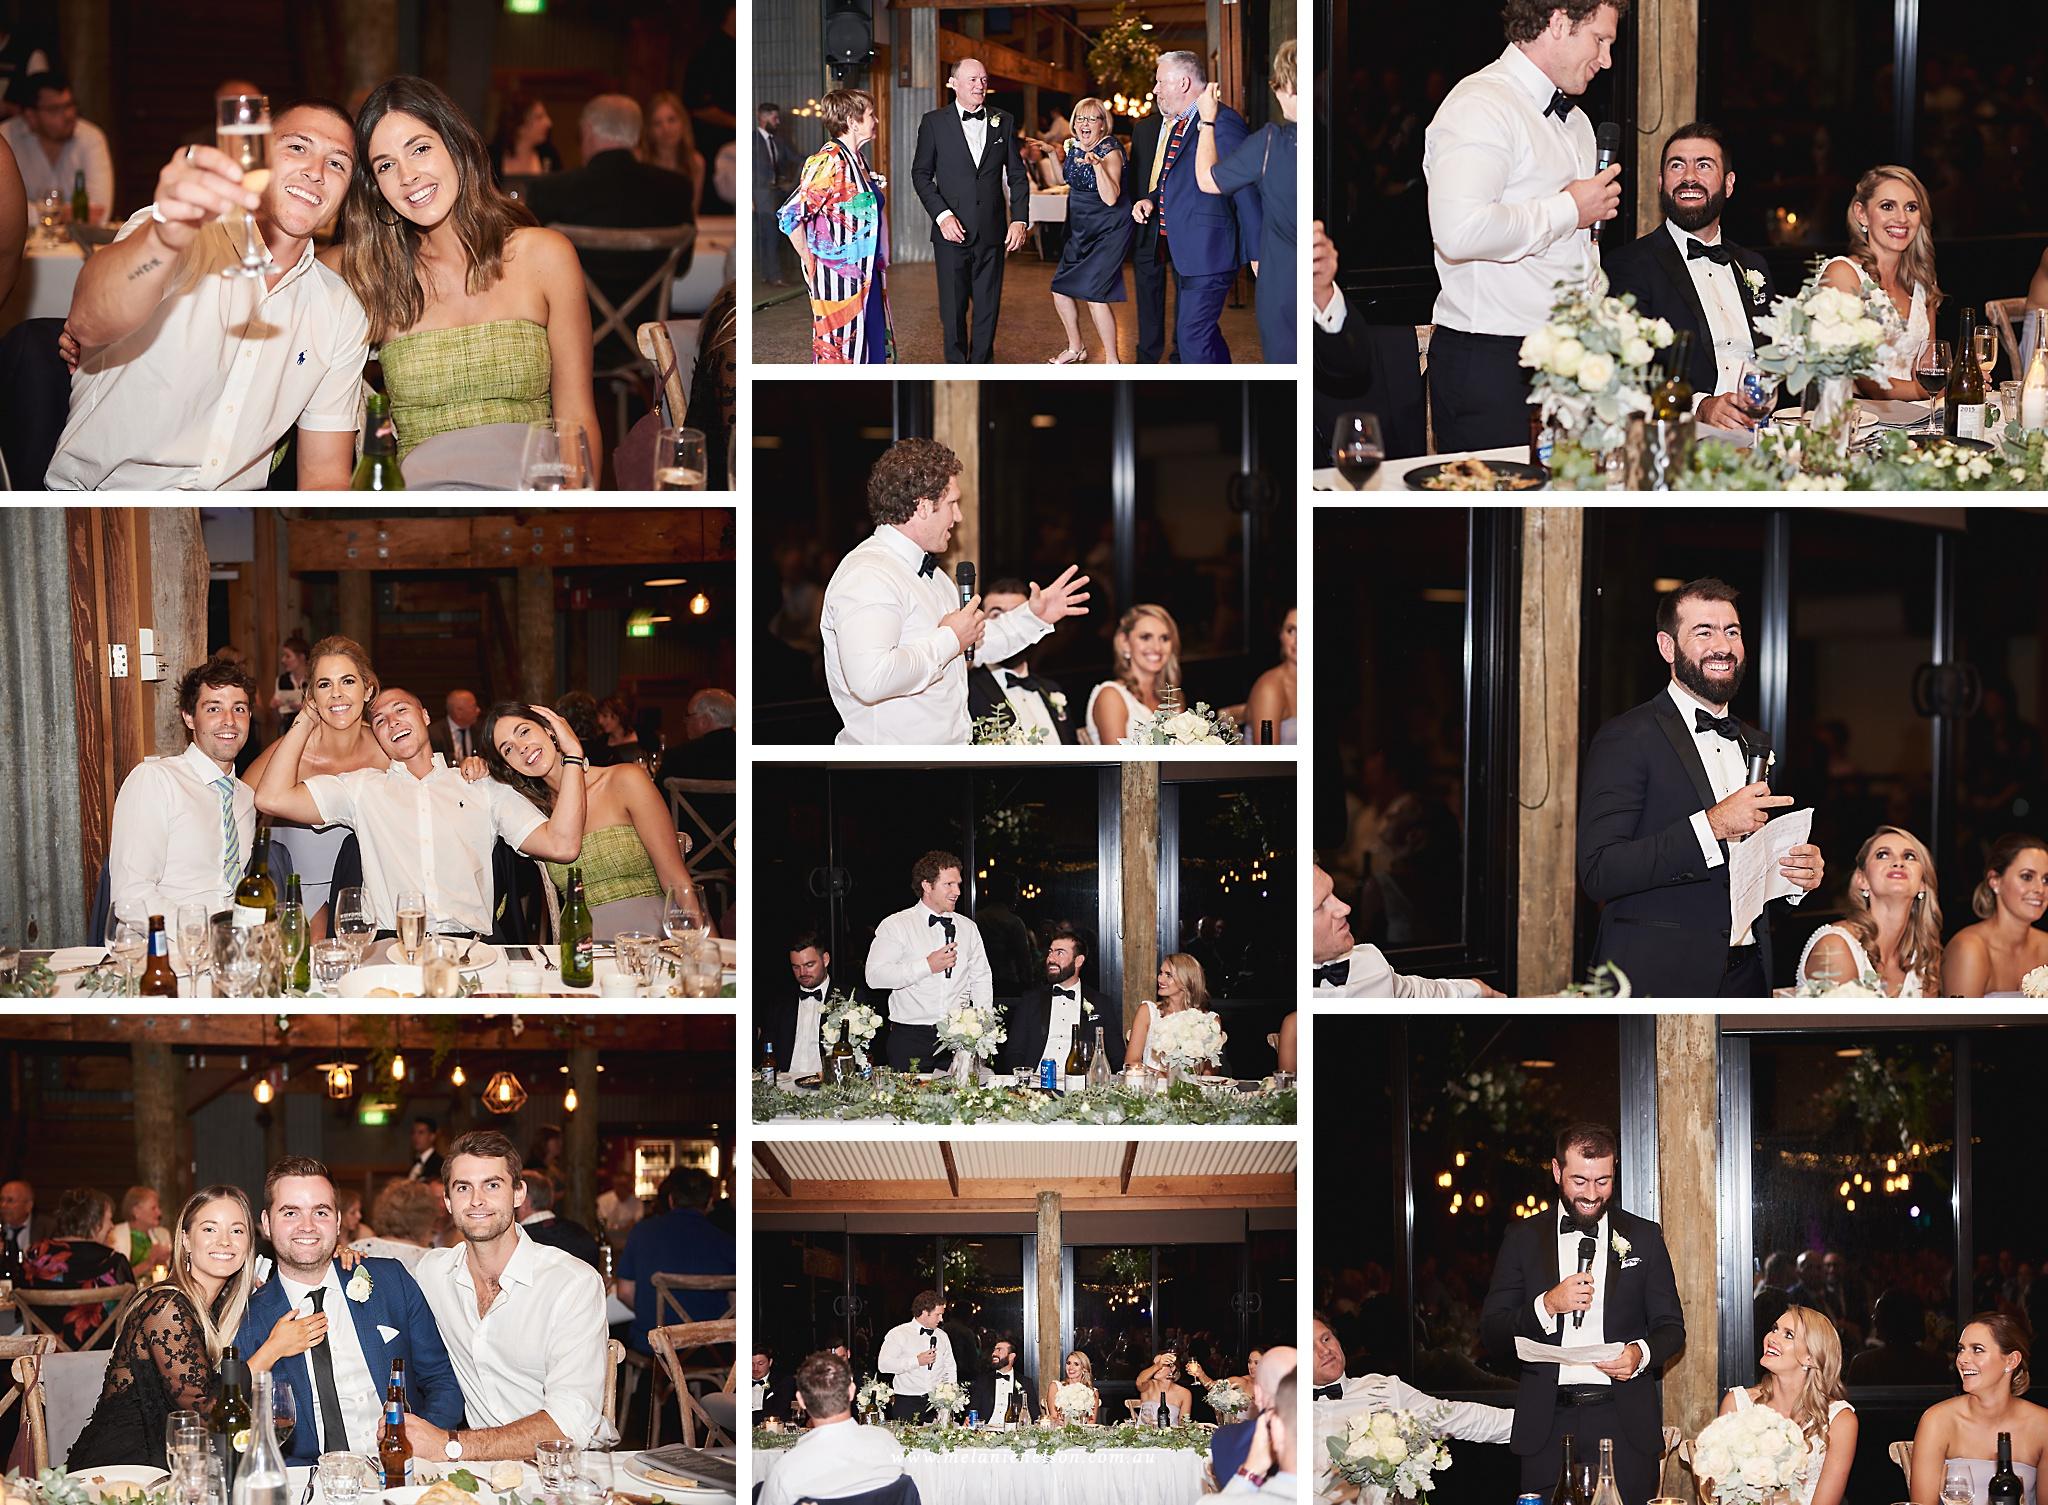 longview_vineyard_wedding_0091.jpg